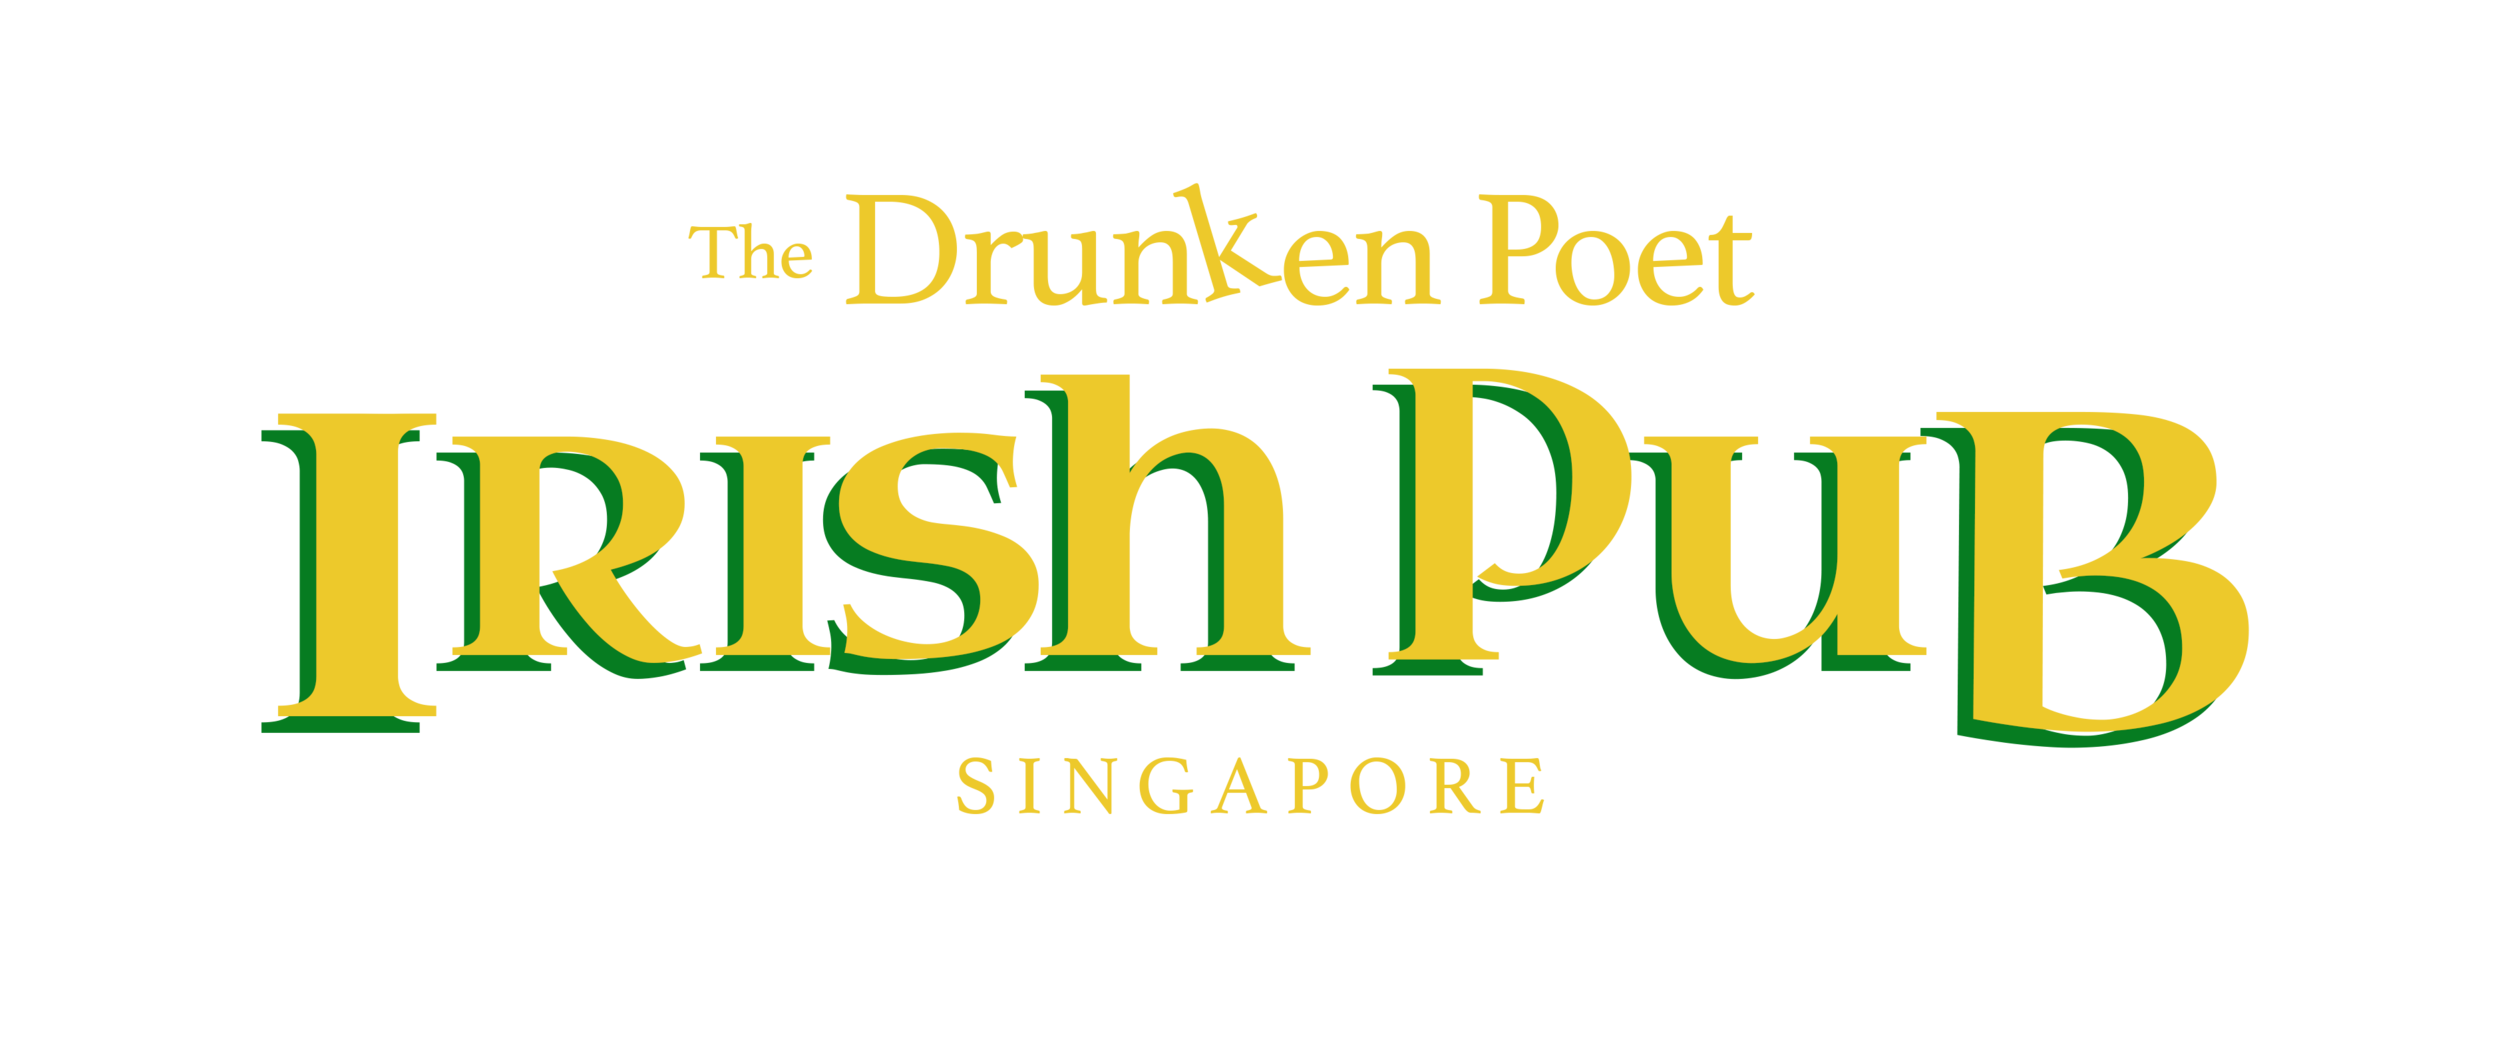 tdp-new-logo.png